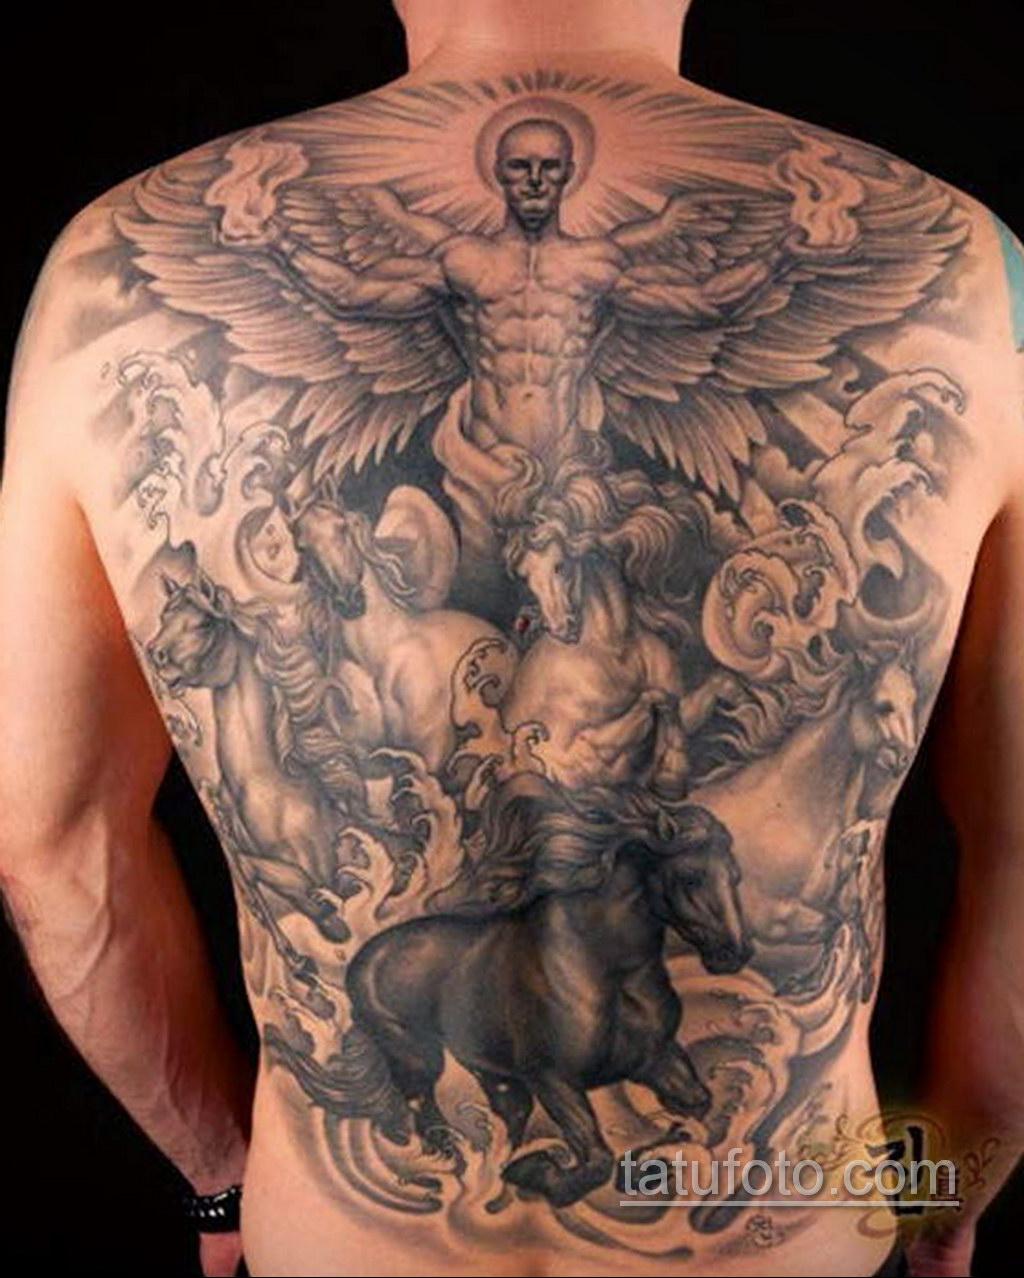 Фото ангельского рисунка тату 22.11.2020 №089 -Angelic tattoo- tatufoto.com